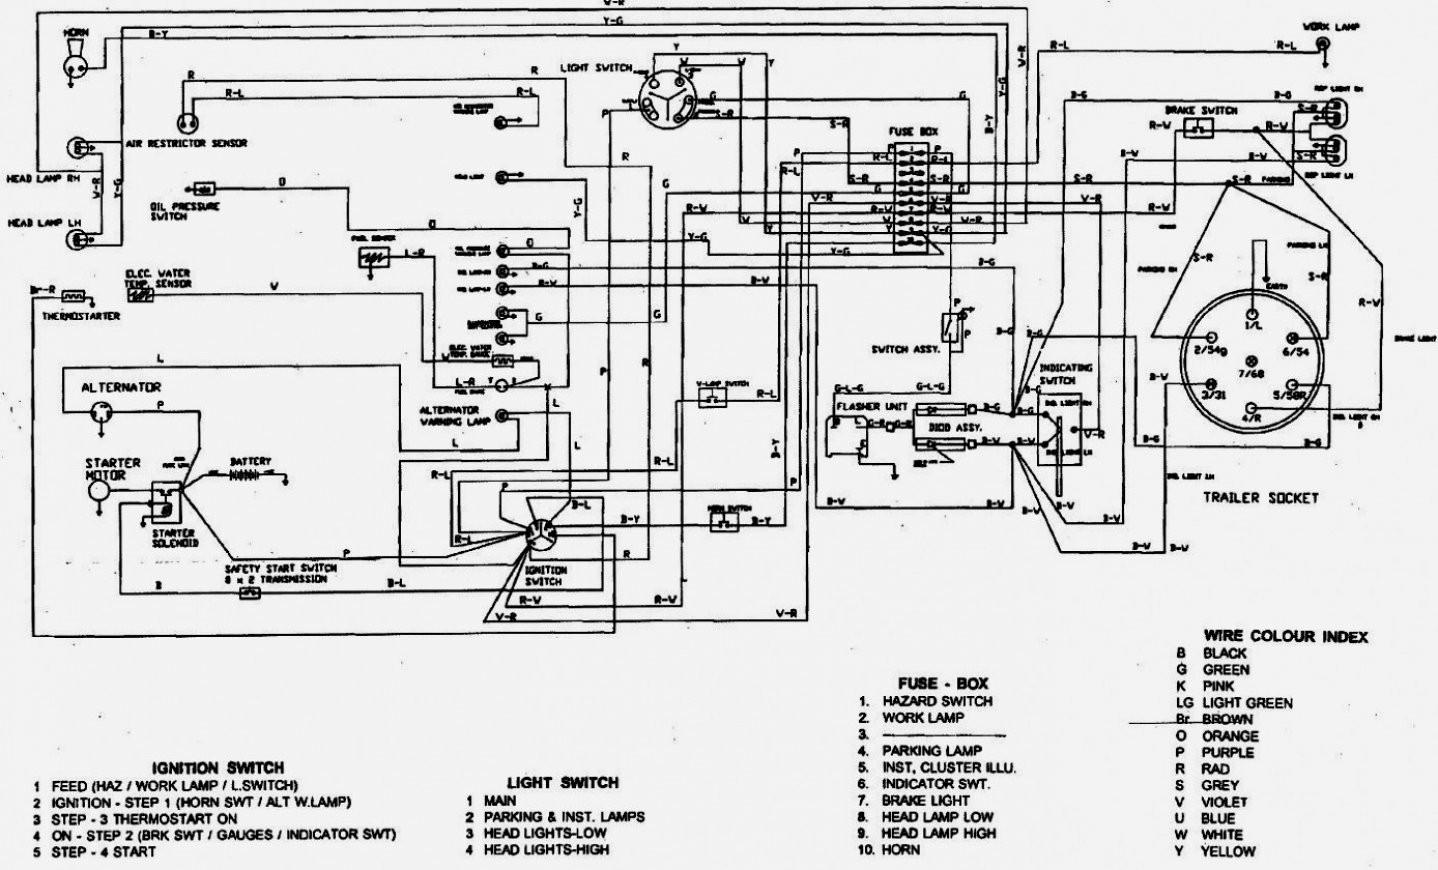 John Deere Lawn Tractor Lt155 Wiring Diagram